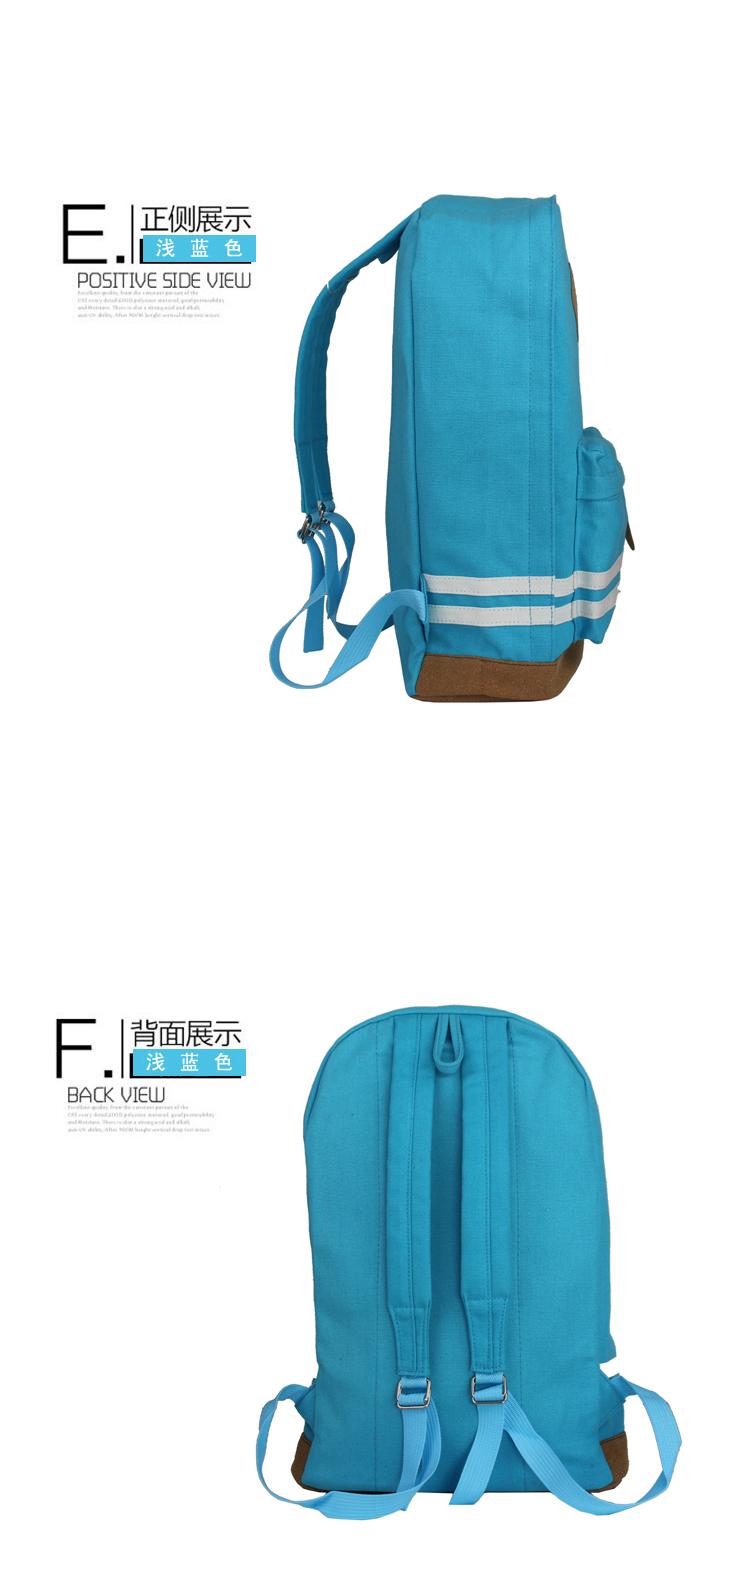 Delong Rui Ba bags BAKMK Bakamaka Korean casual canvas shoulder bag sports bag bag bag female students AM2211 dark green